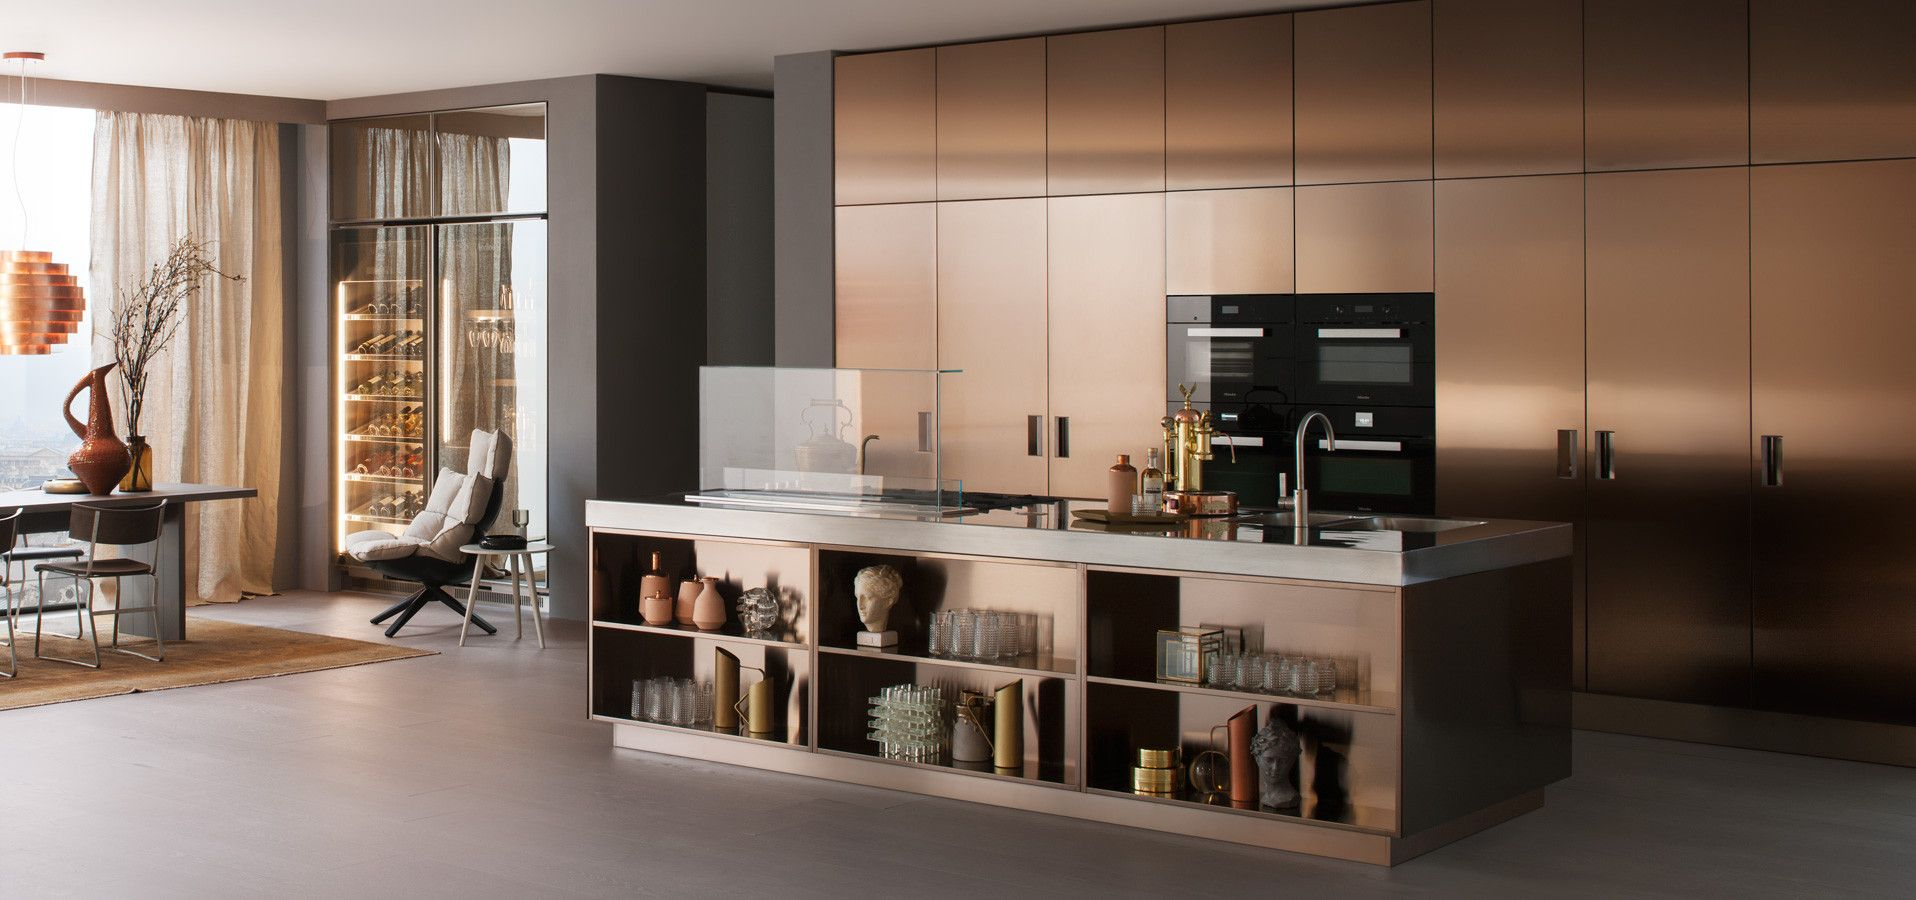 Perfekt Arclinea I Küche Italia